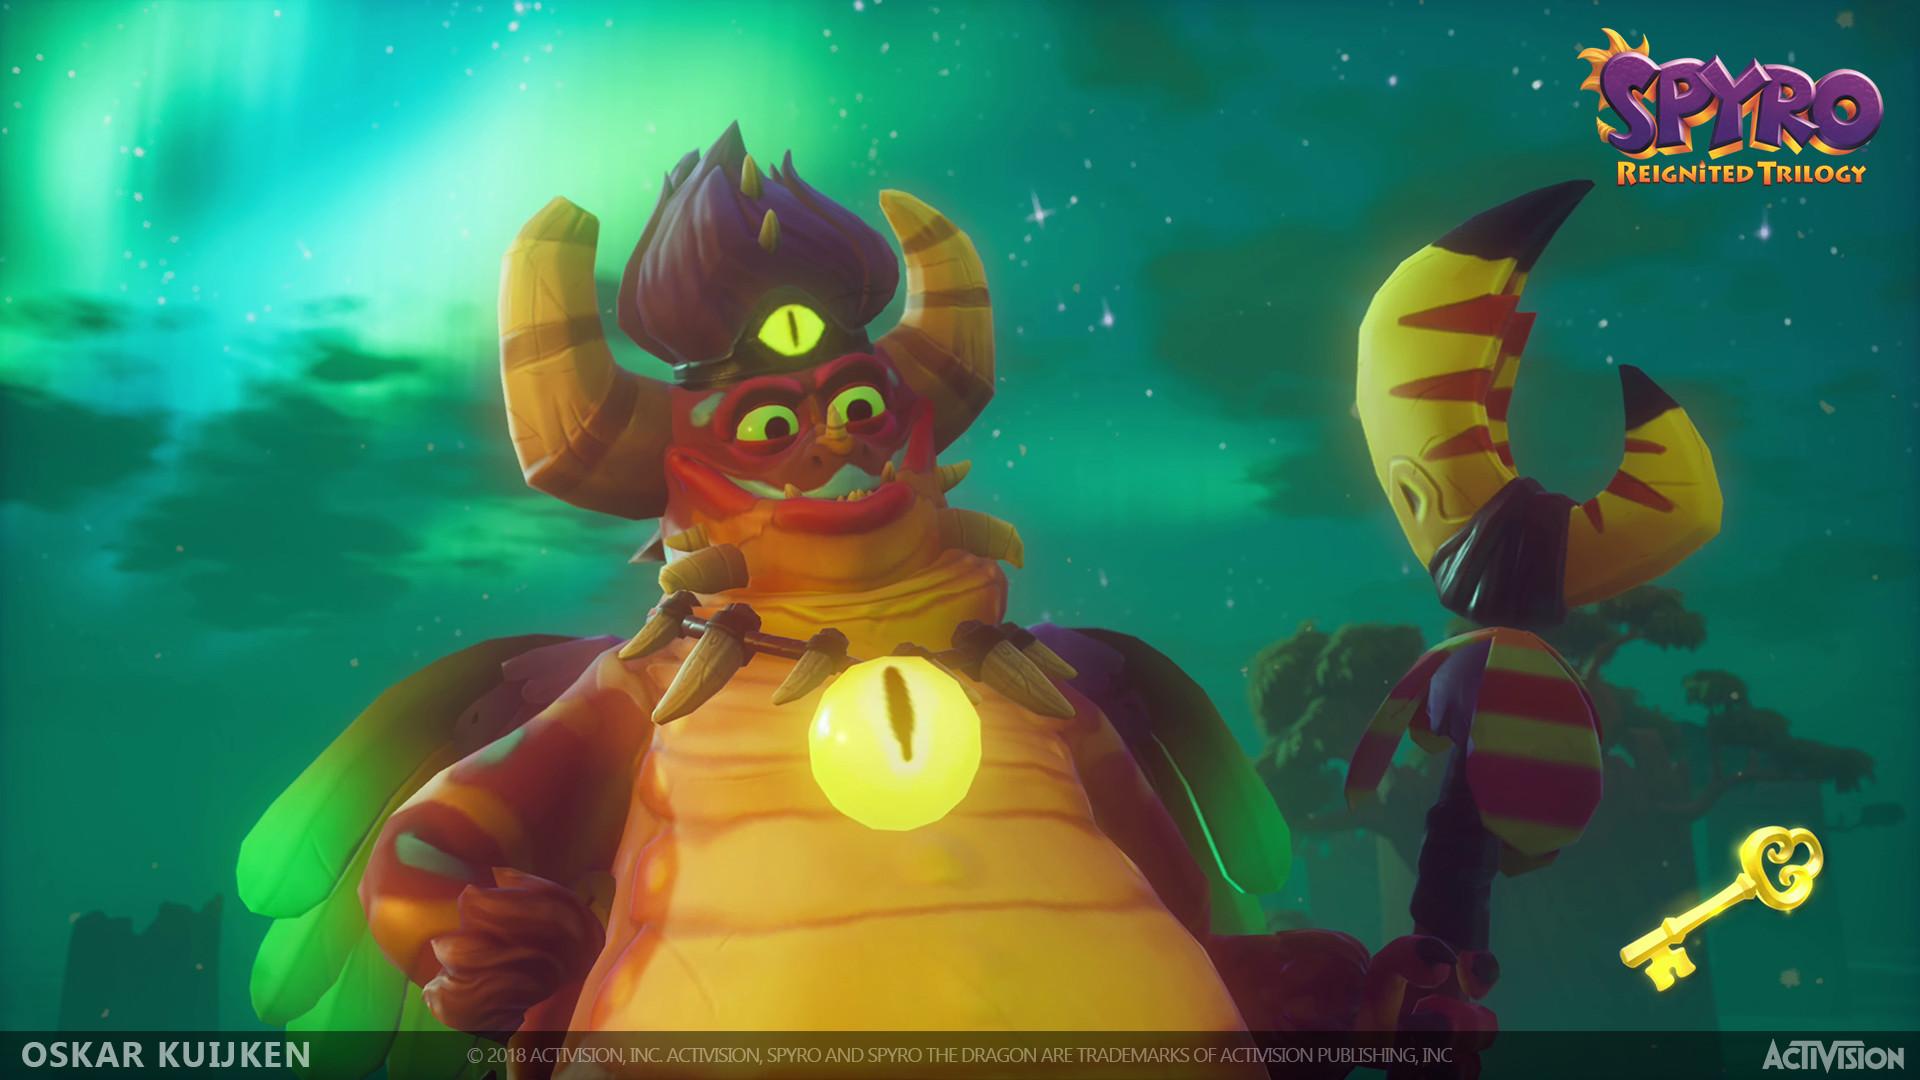 ArtStation - Spyro Reignited Trilogy - Jed , Oskar Kuijken